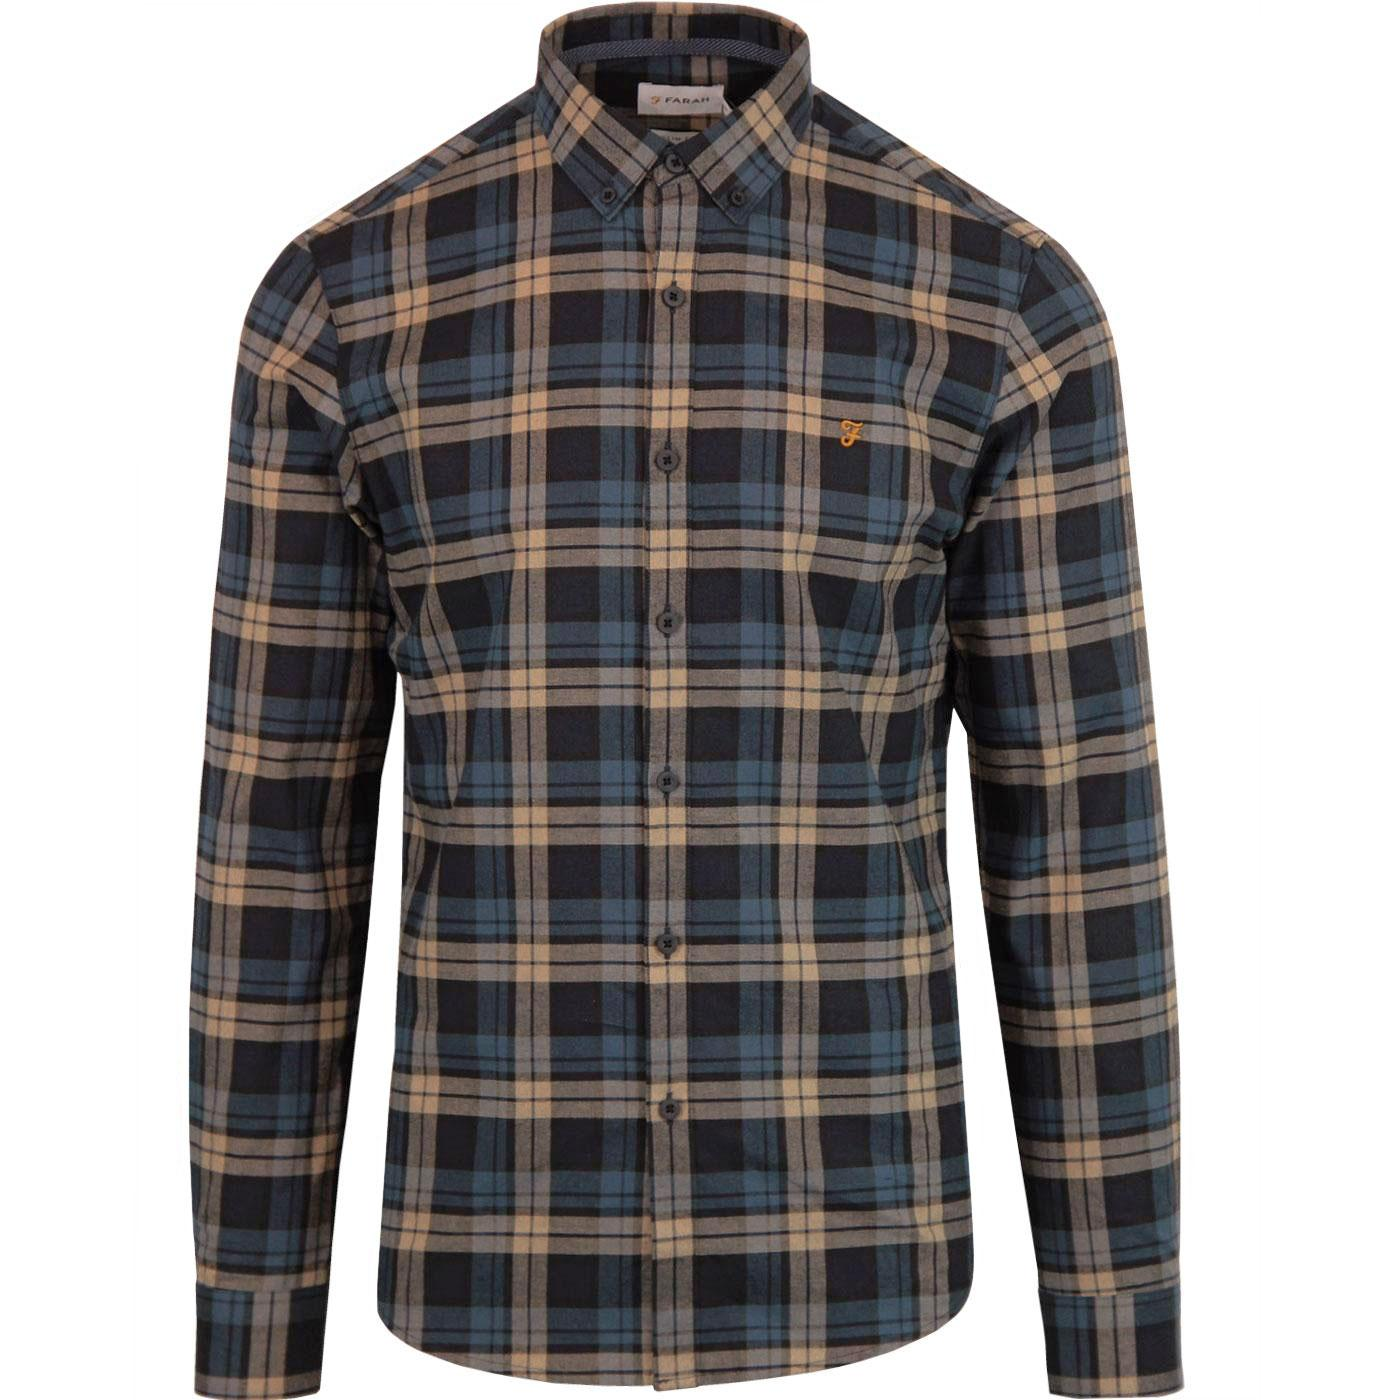 Radley FARAH Mod Button Down Check Shirt - Canvas